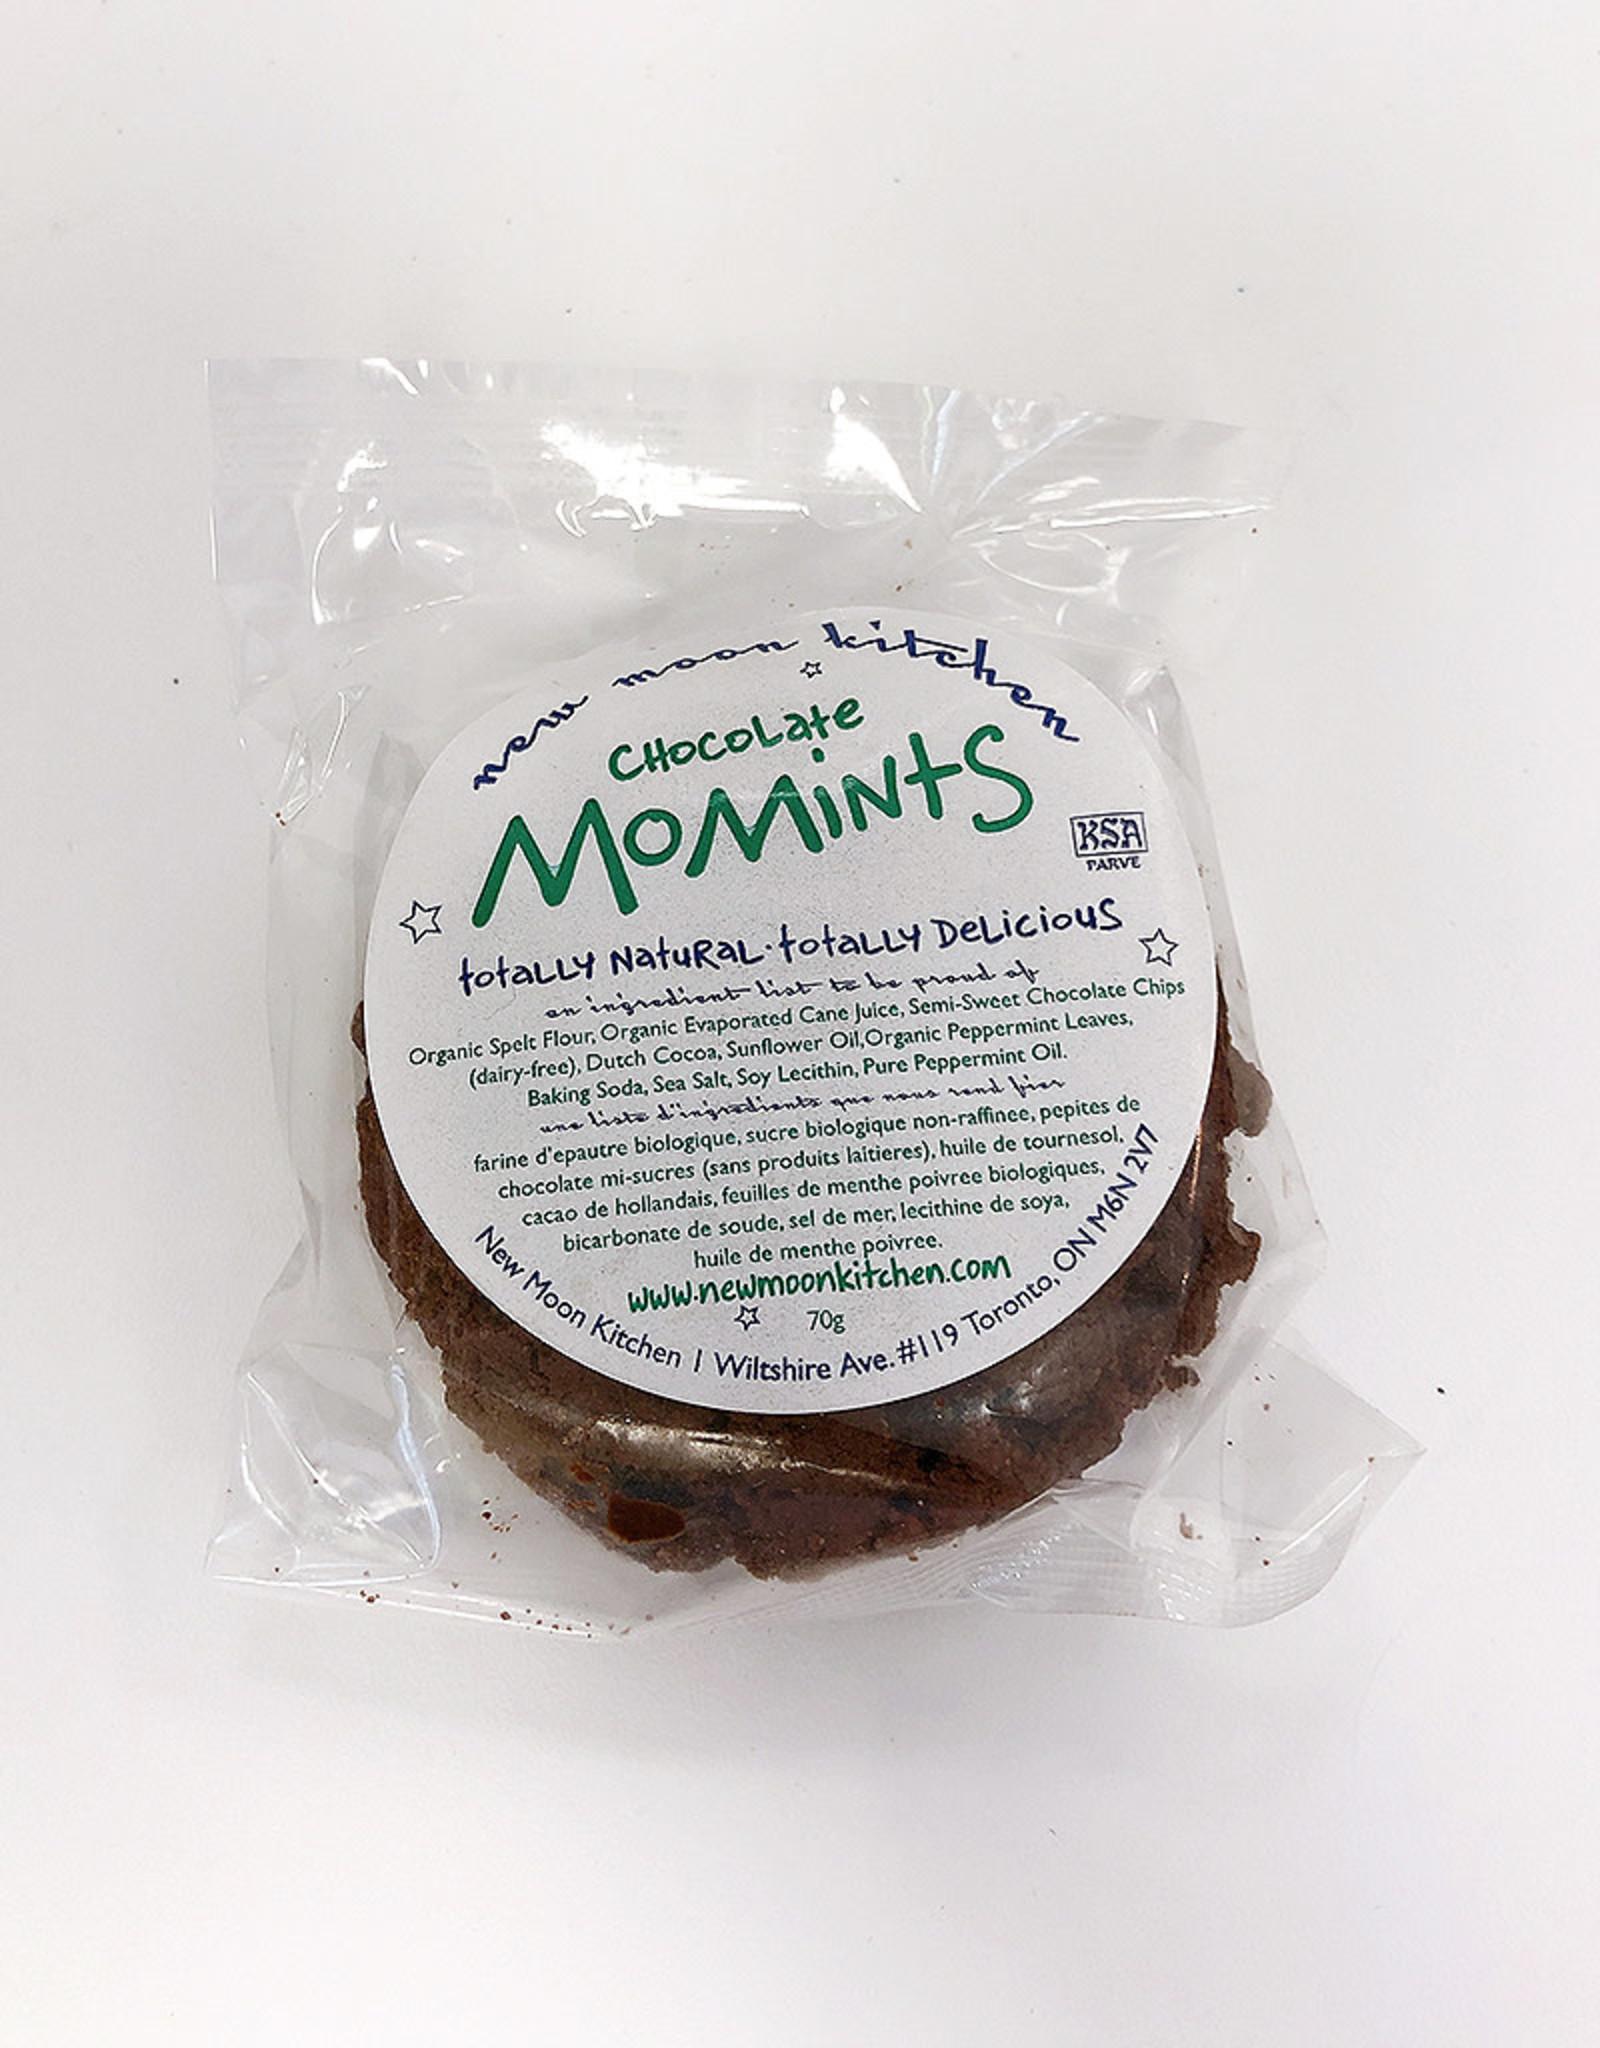 New Moon Kitchen New Moon Kitchen - Cookies, Chocolate Mint Momints (2 pk)